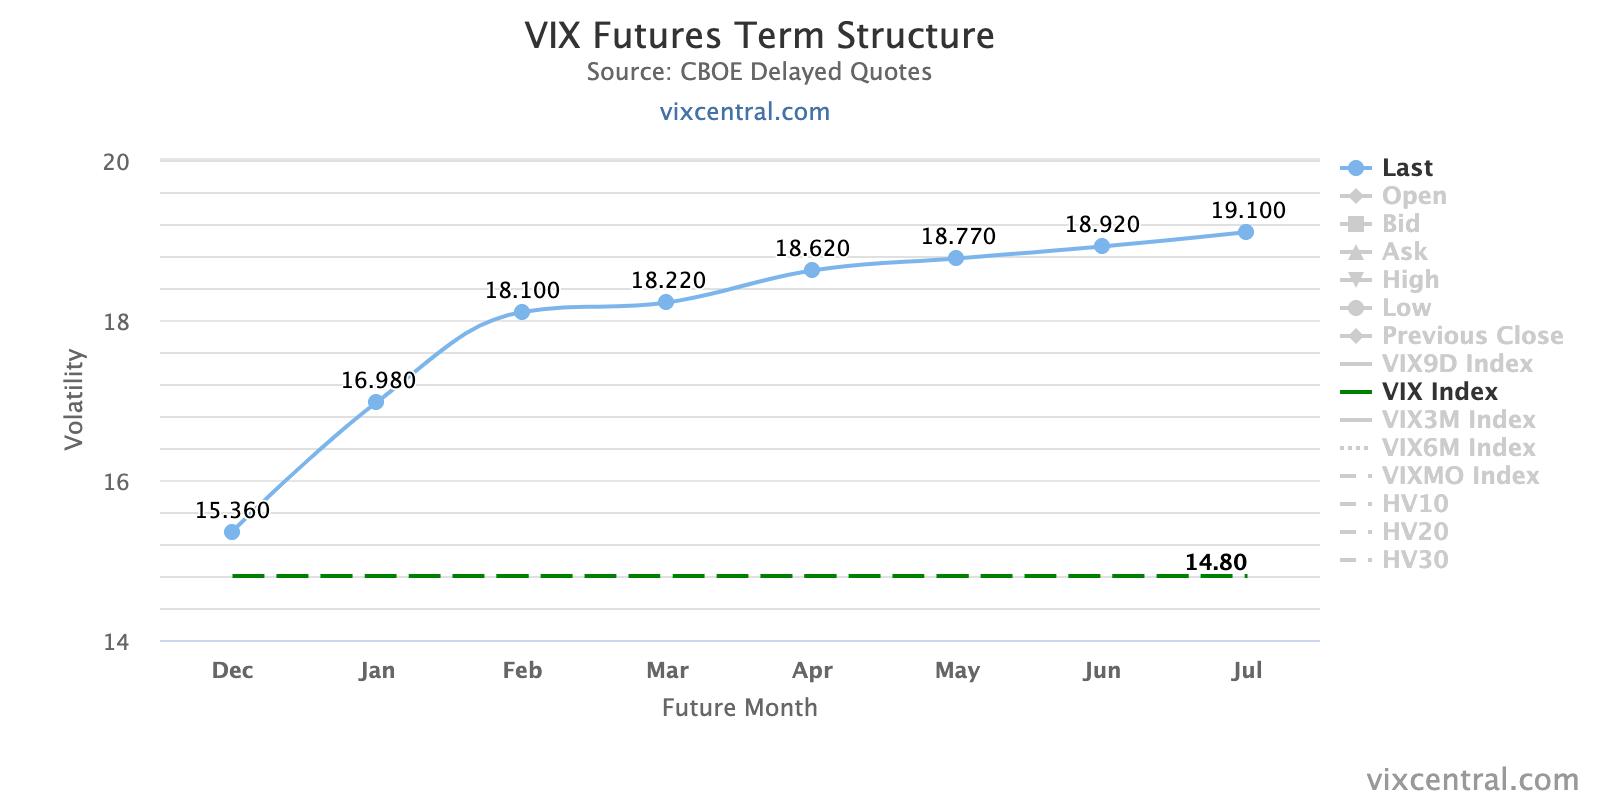 vix-futures-term-structu